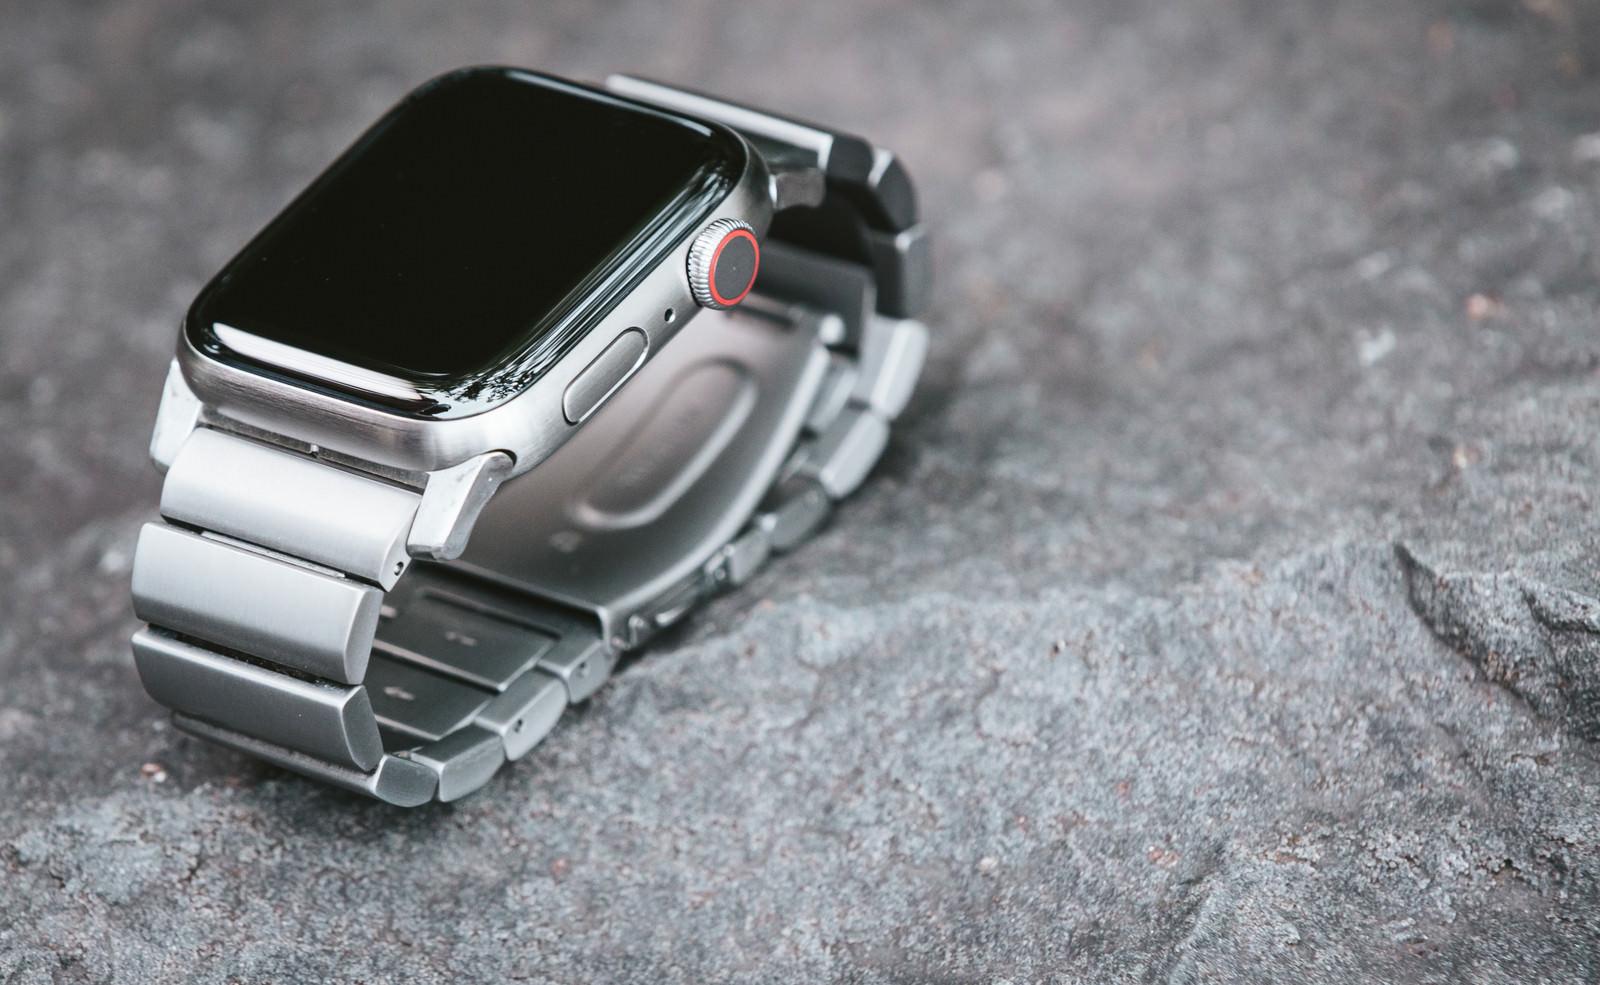 「Apple Watch Series 5」の写真